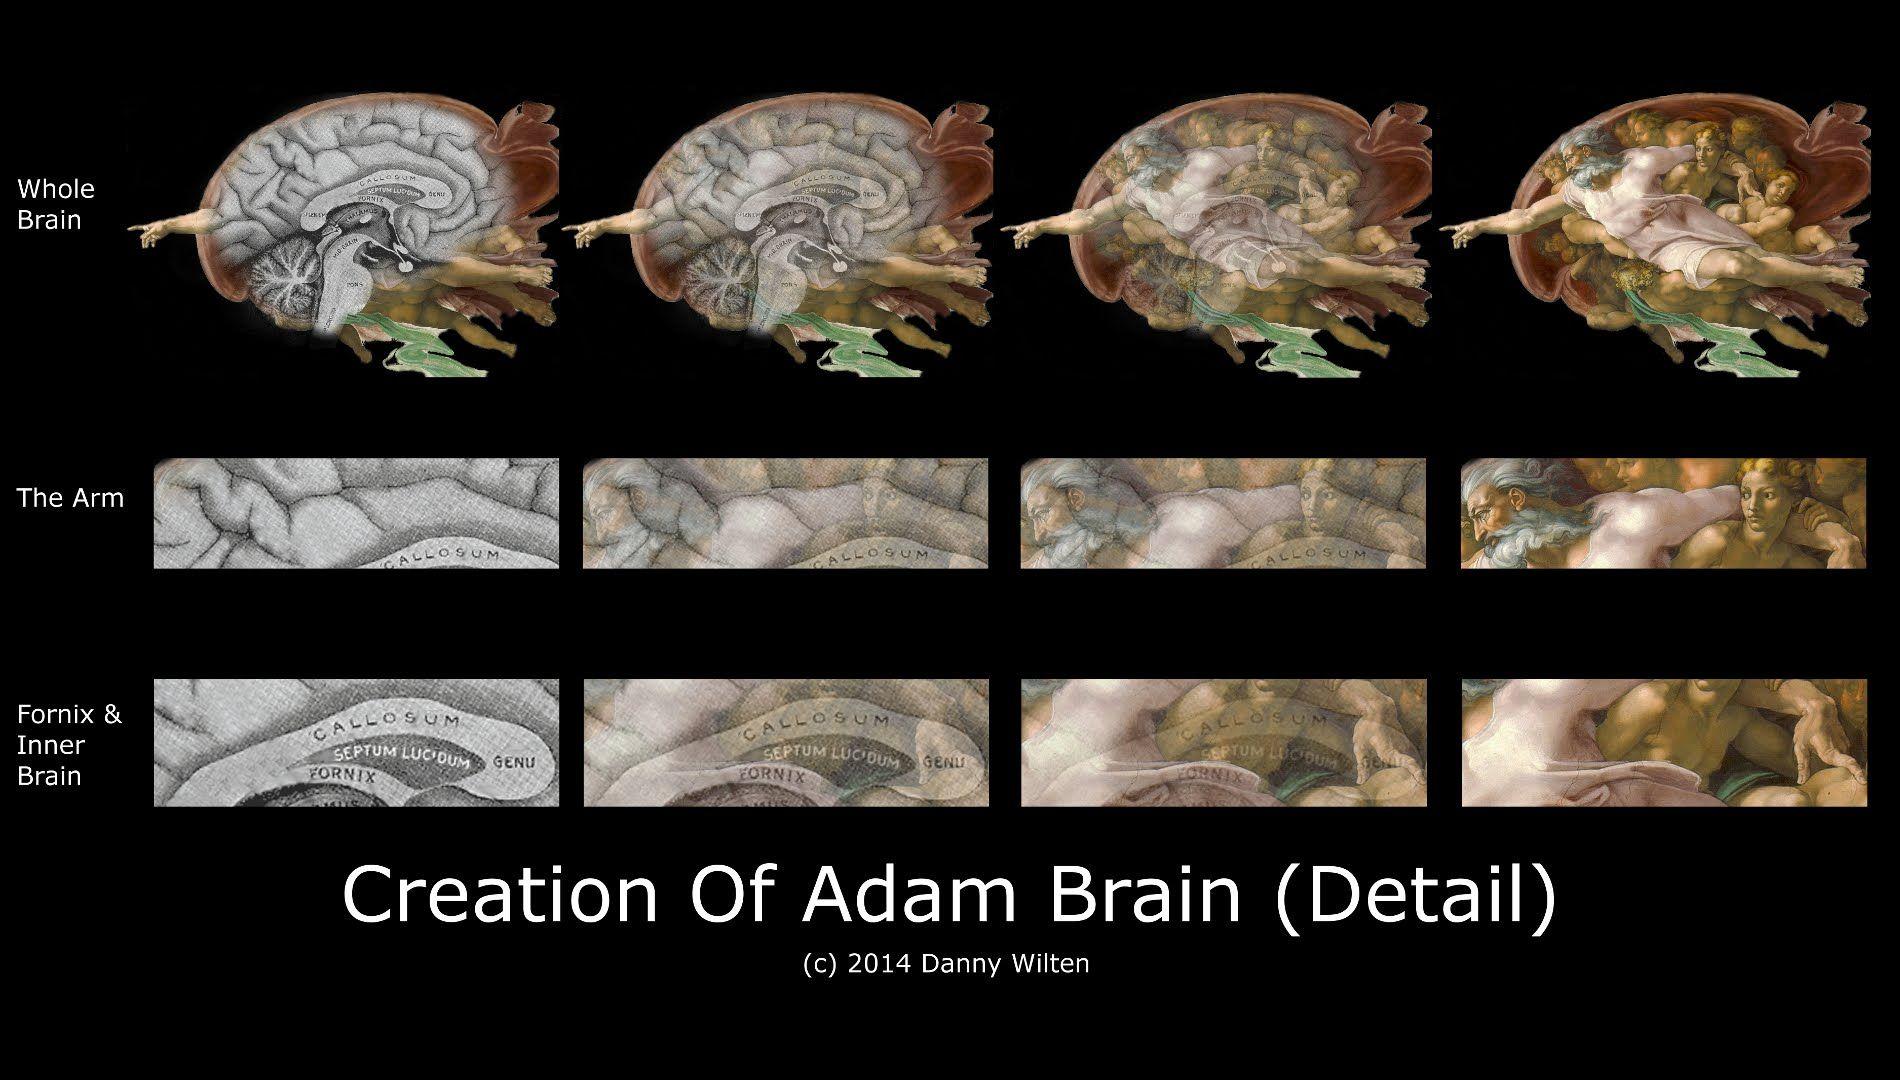 Danny Wilten - Creation Of Adam Brain Detail Using Grey\'s Anatomy ...